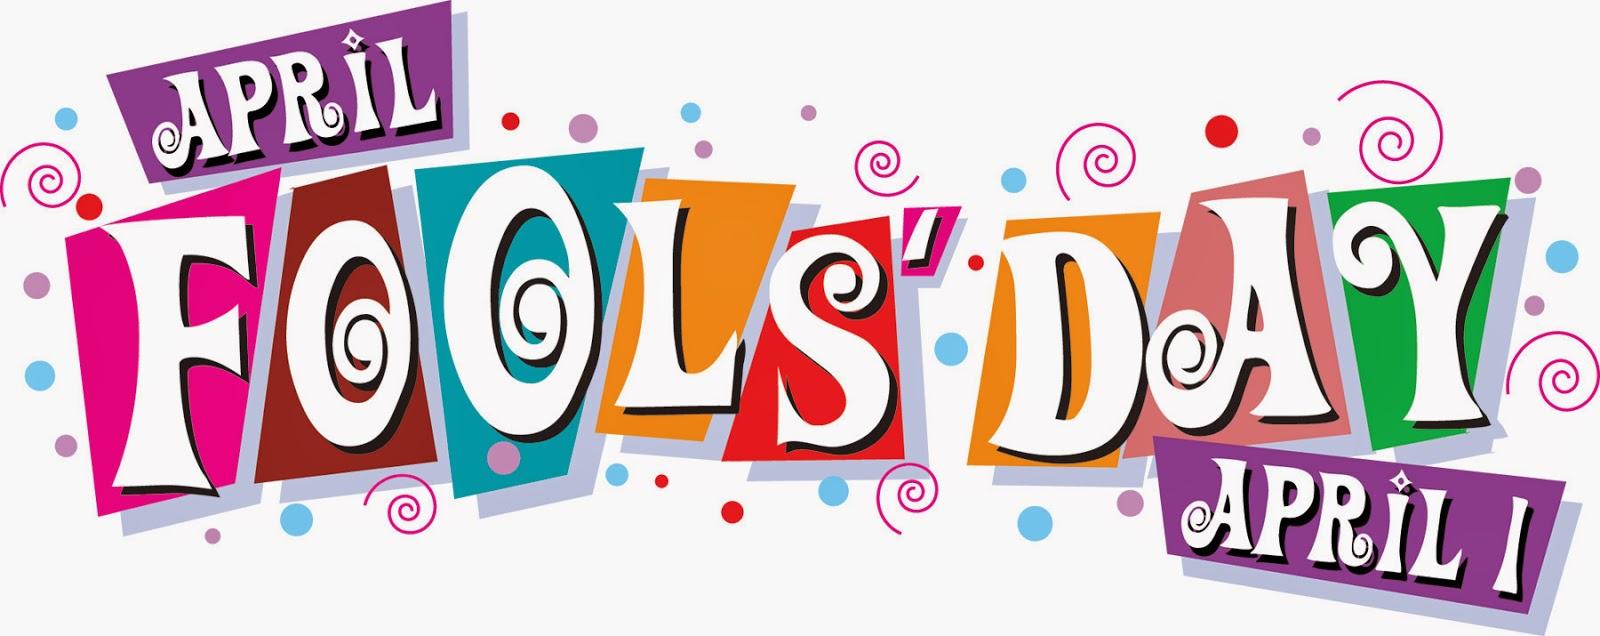 Happy April Fool Day 2015